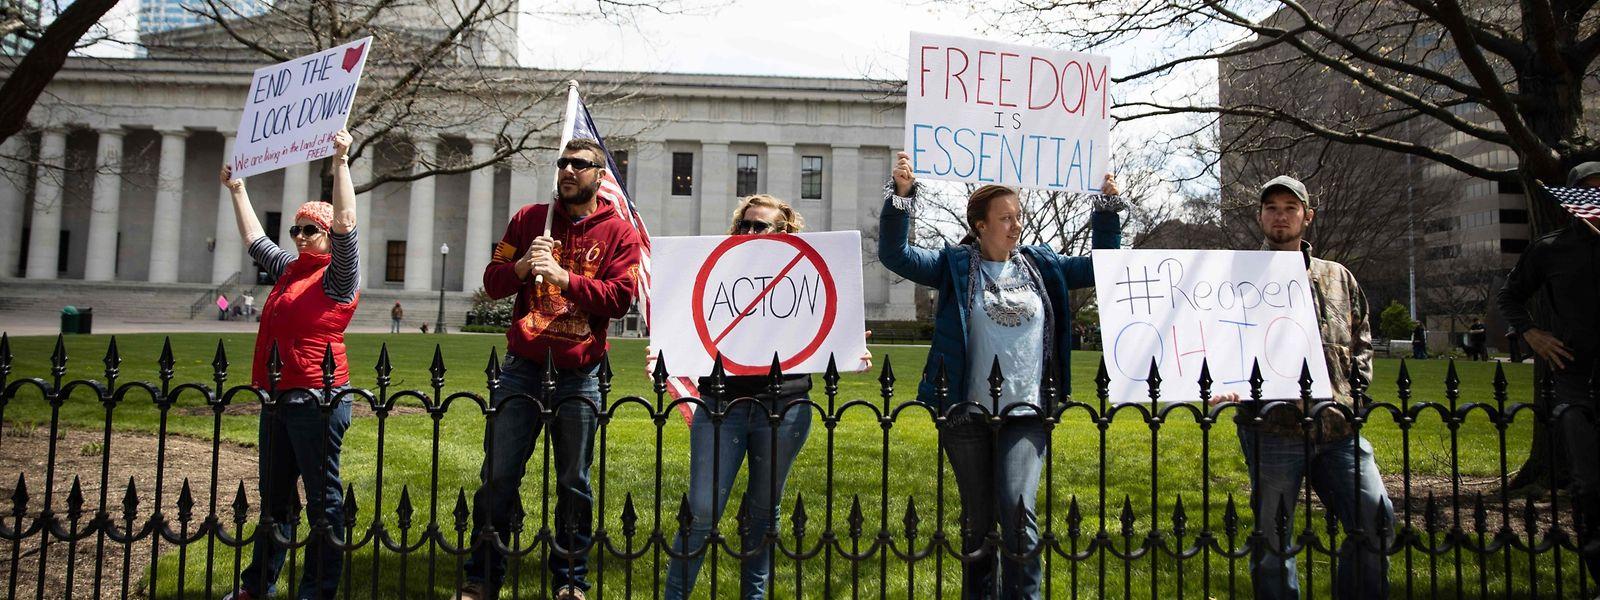 Demonstranten in Columbus, Ohio, fordern ein Ende des Lockdowns.